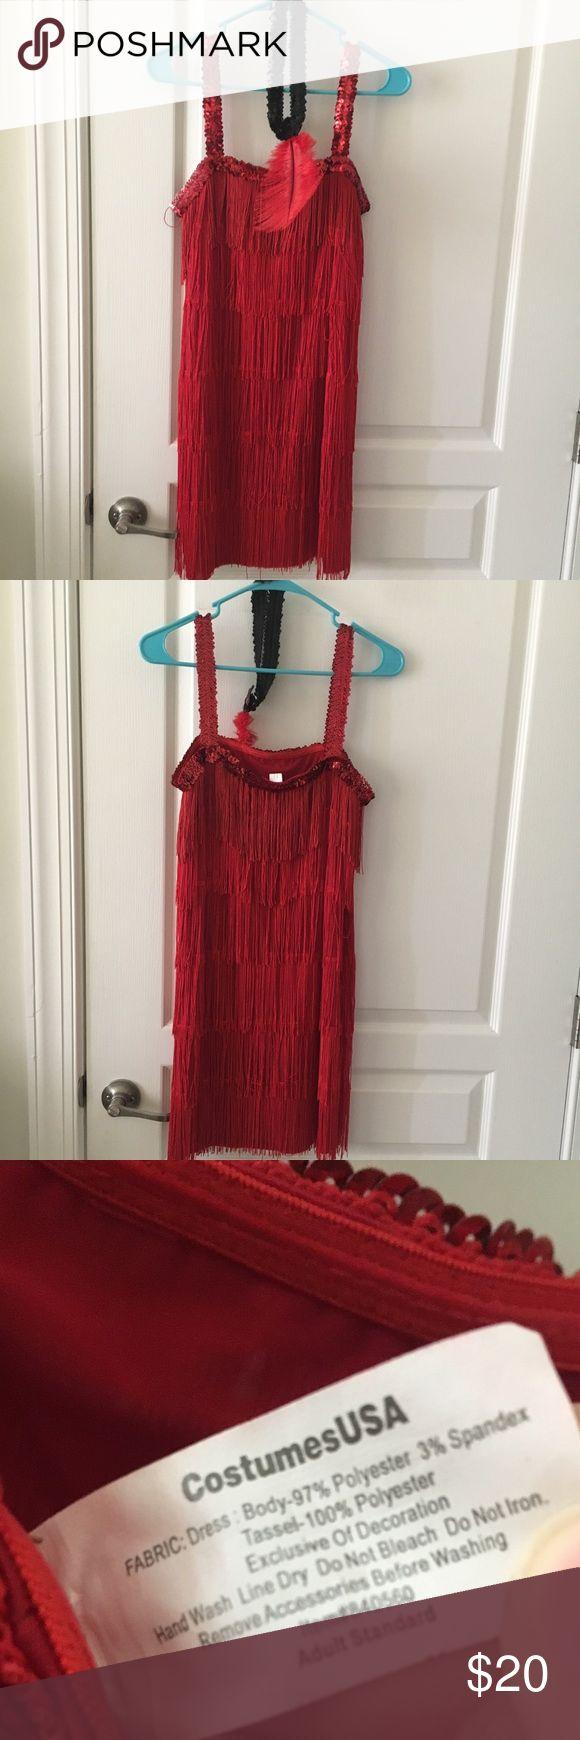 Red flapper dress / Halloween costume Super cute red flapper dress / costume. Comes with the headpiece. Tassels and jeweled. I offer discounts for bundles :) Dresses Midi